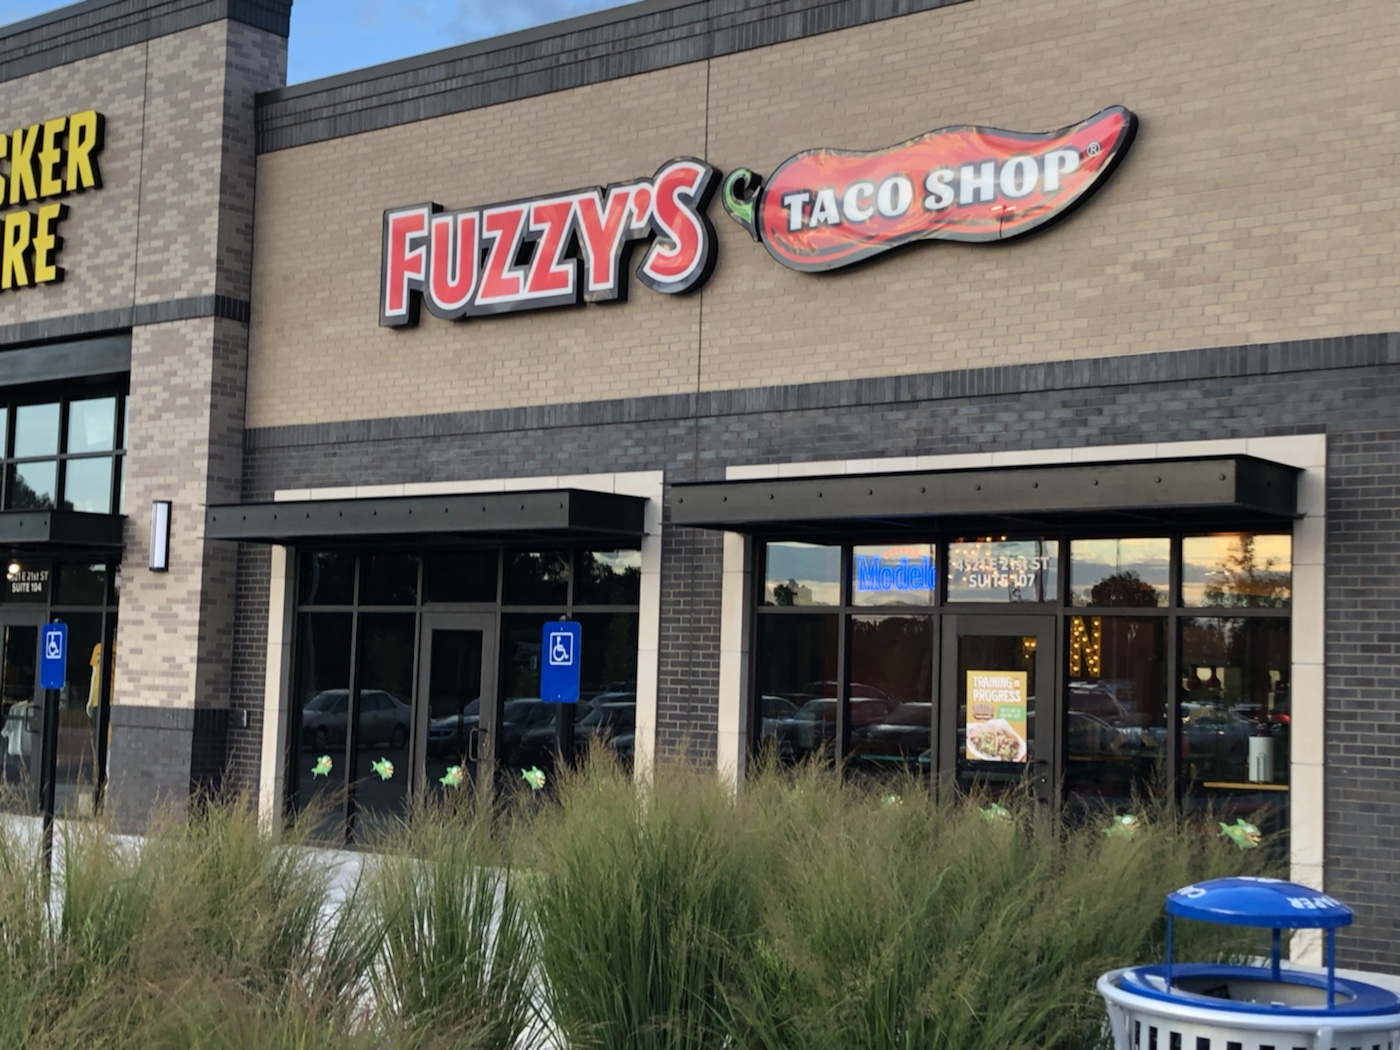 Fuzzy's Taco Shop at WSU